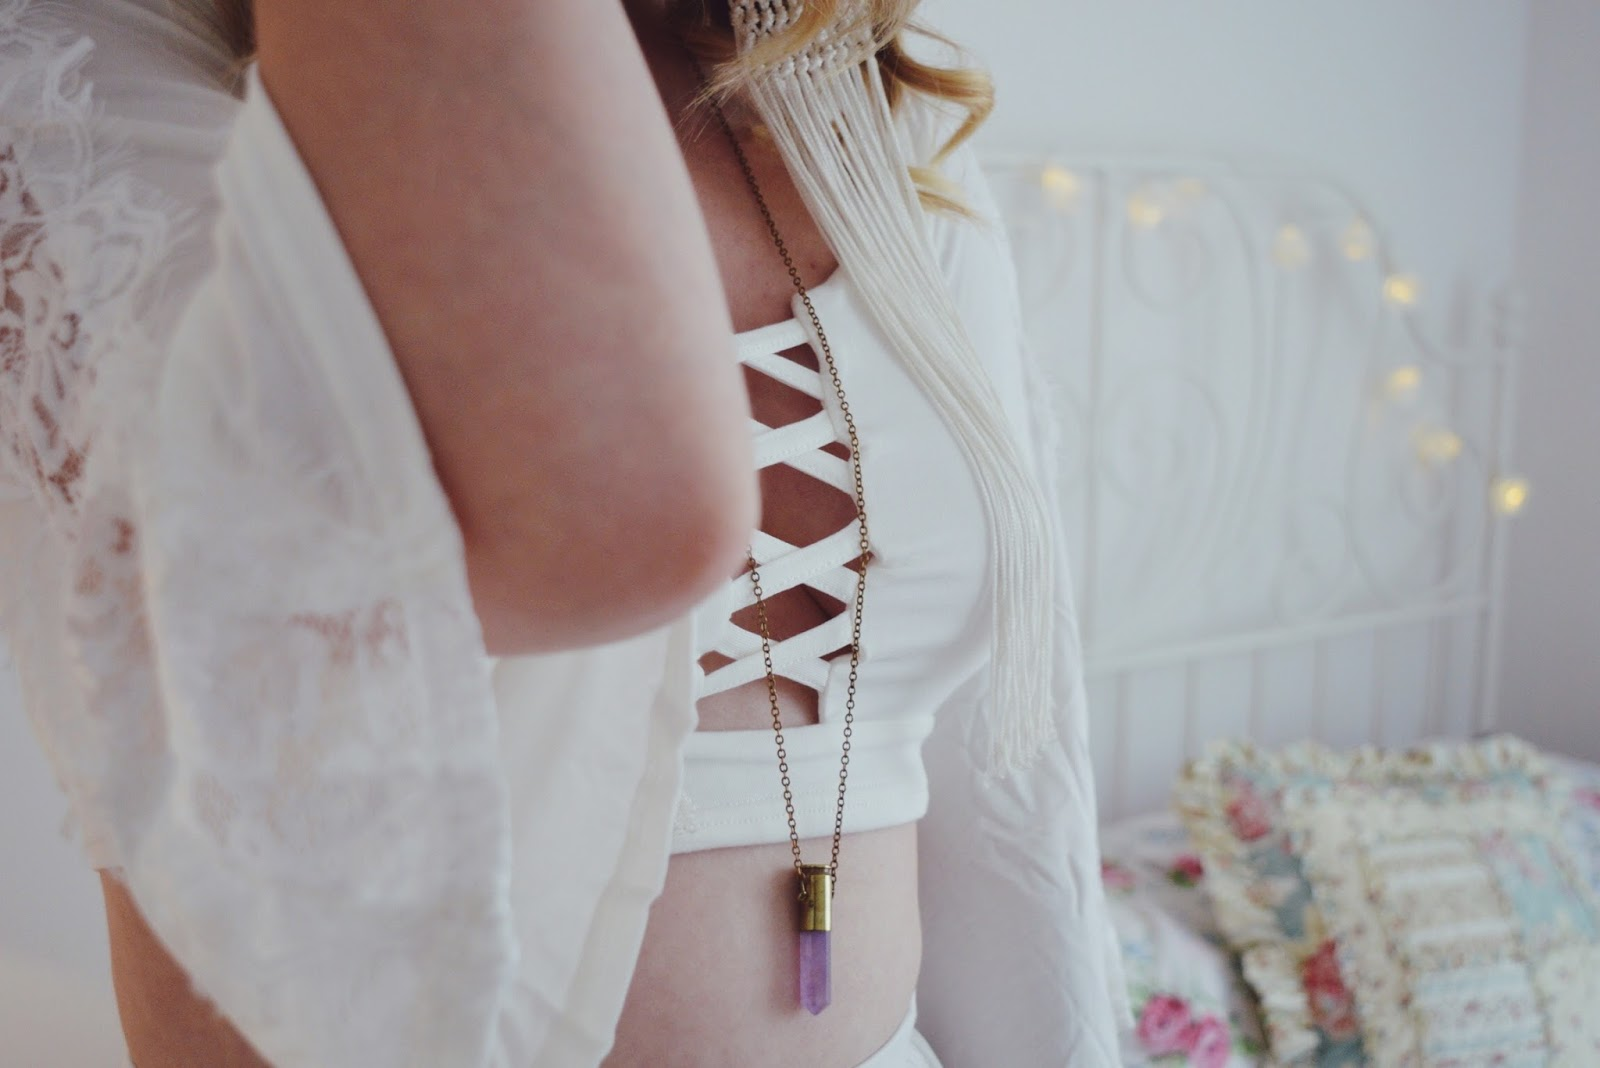 White Lace Two Piece from Boohoo.com, FashionFake, Fashion bloggers